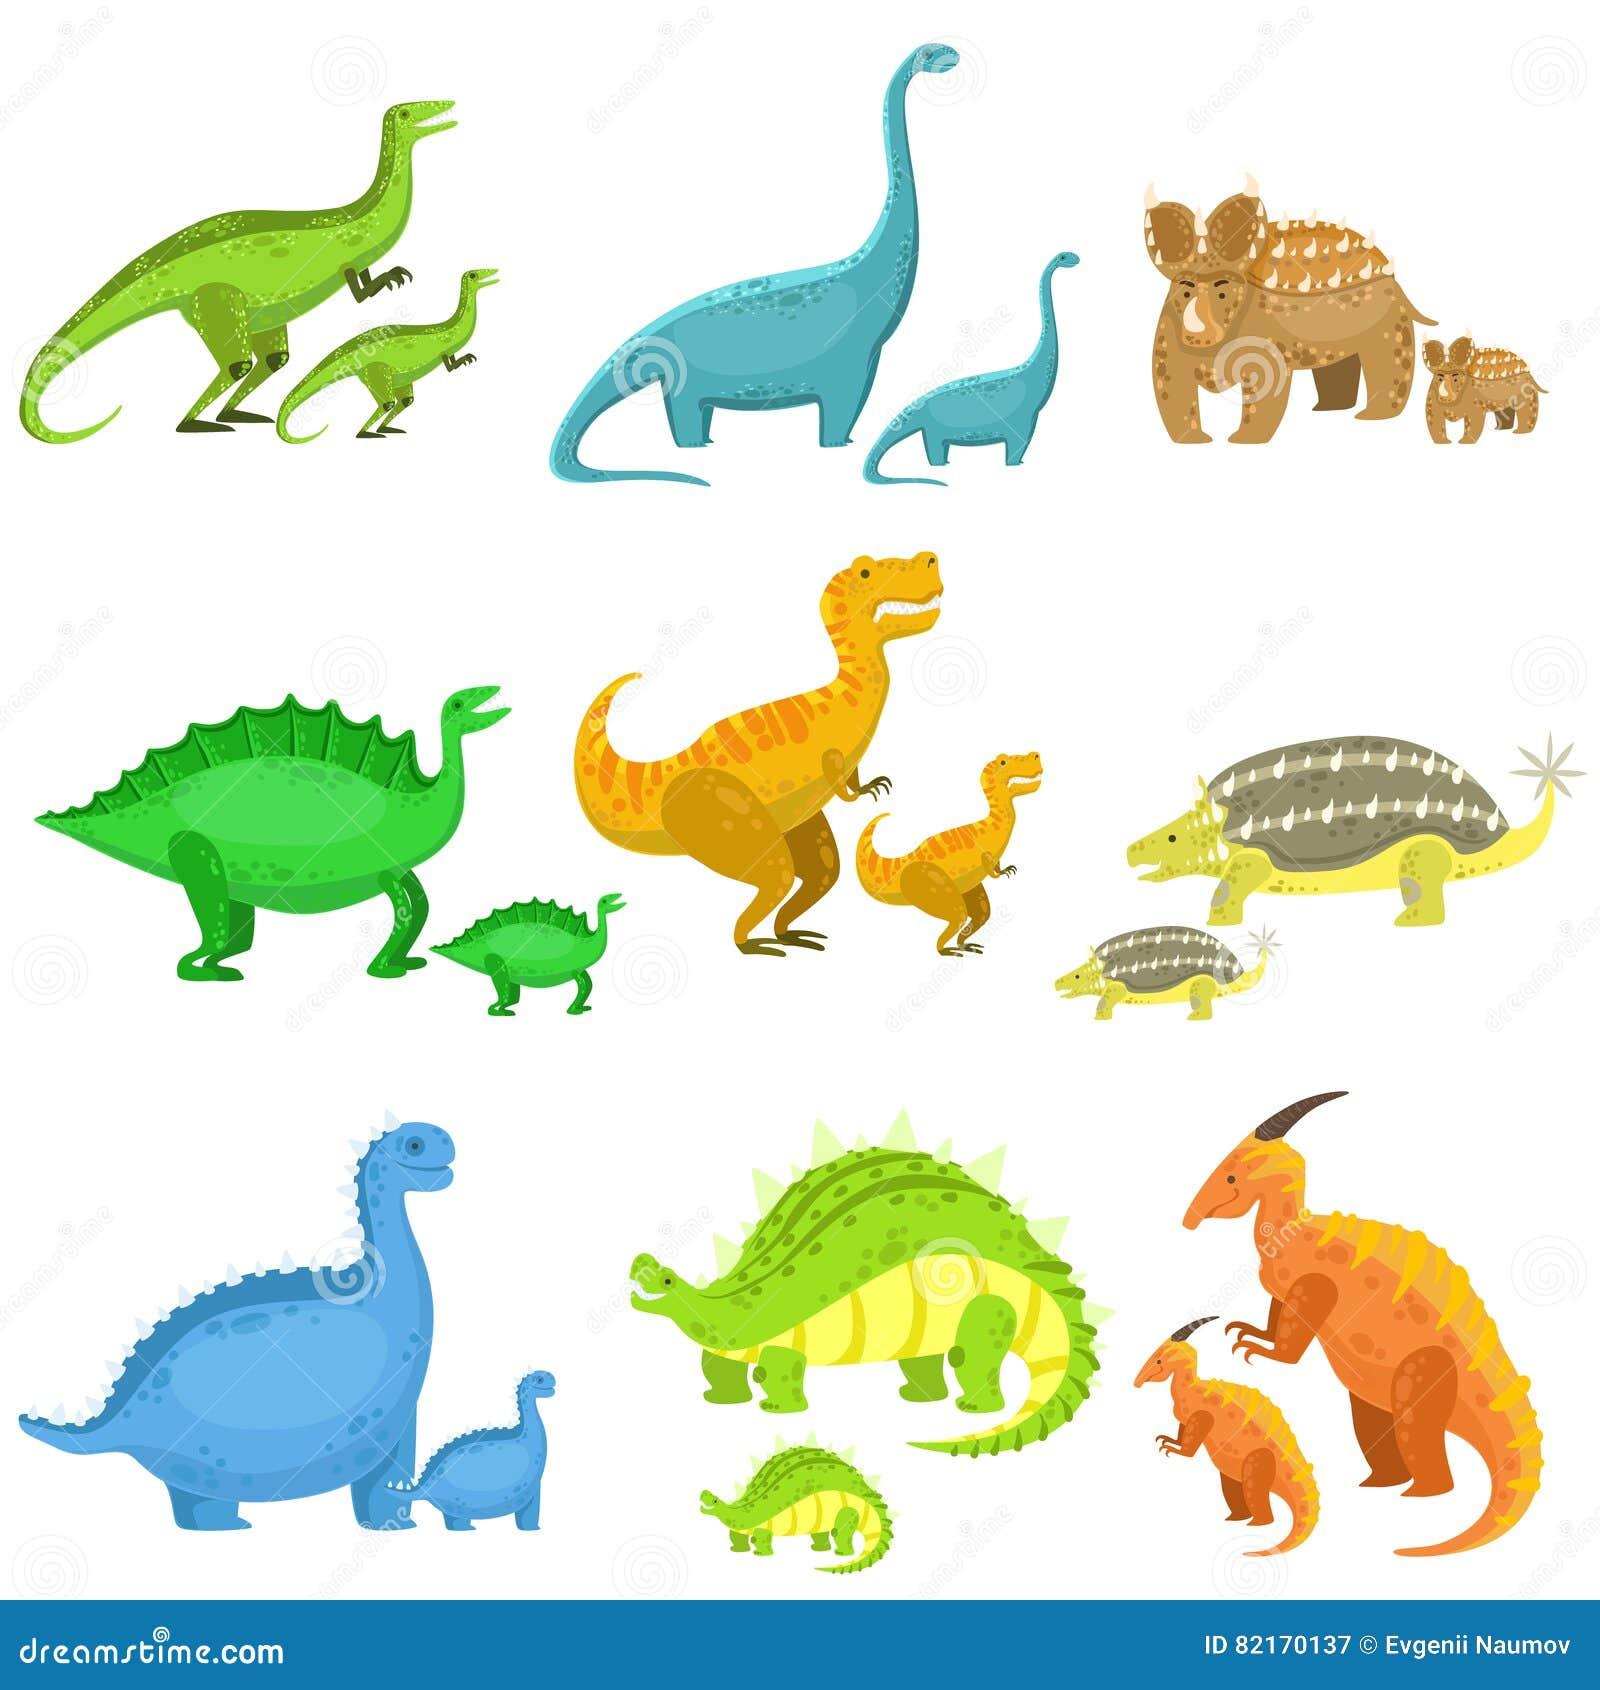 Dinosaur with a big thumb